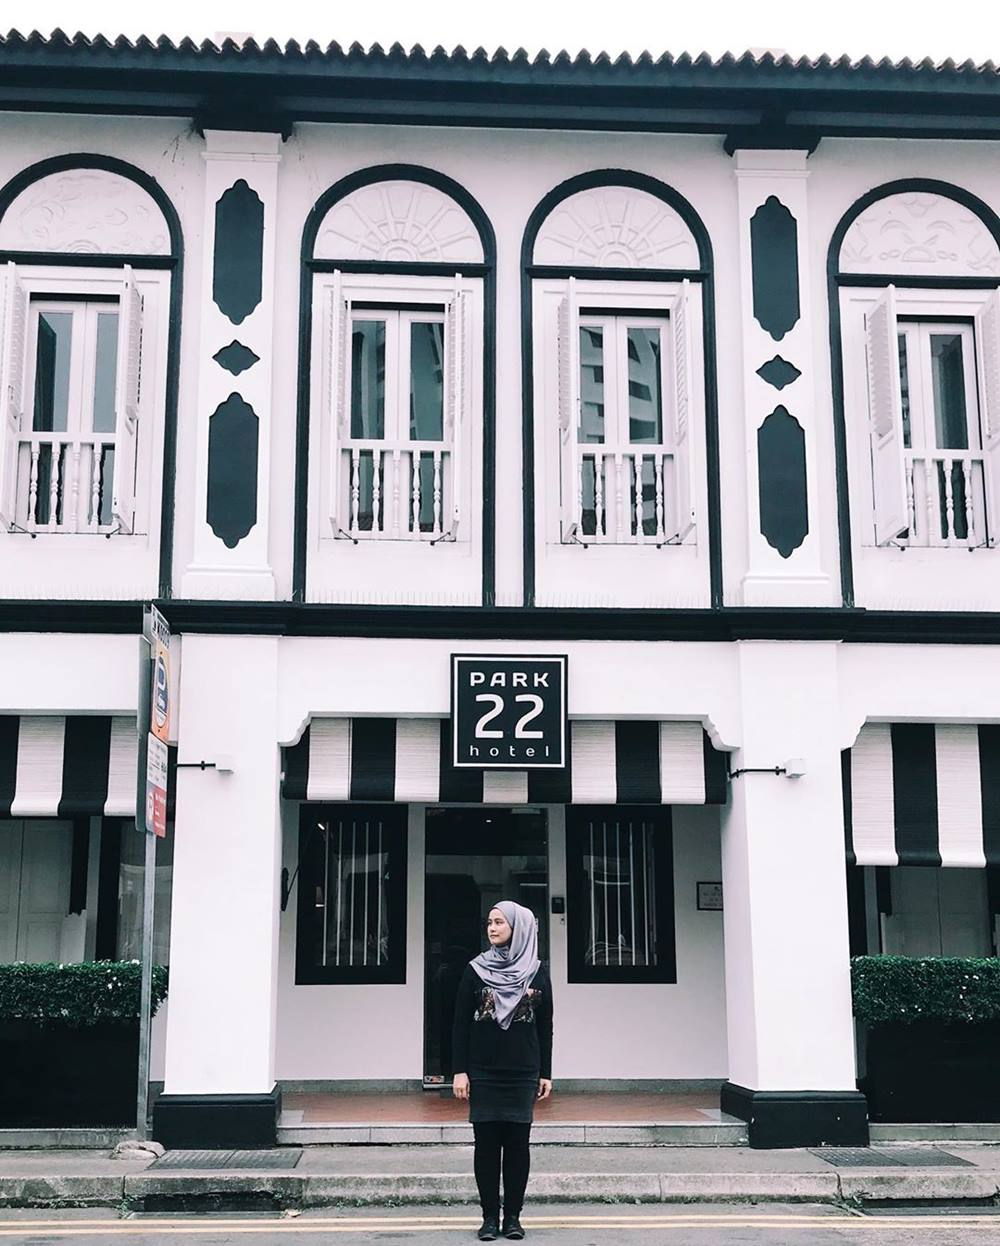 Park 22 Hotel Little India. Instagram @nuurill_mofiy